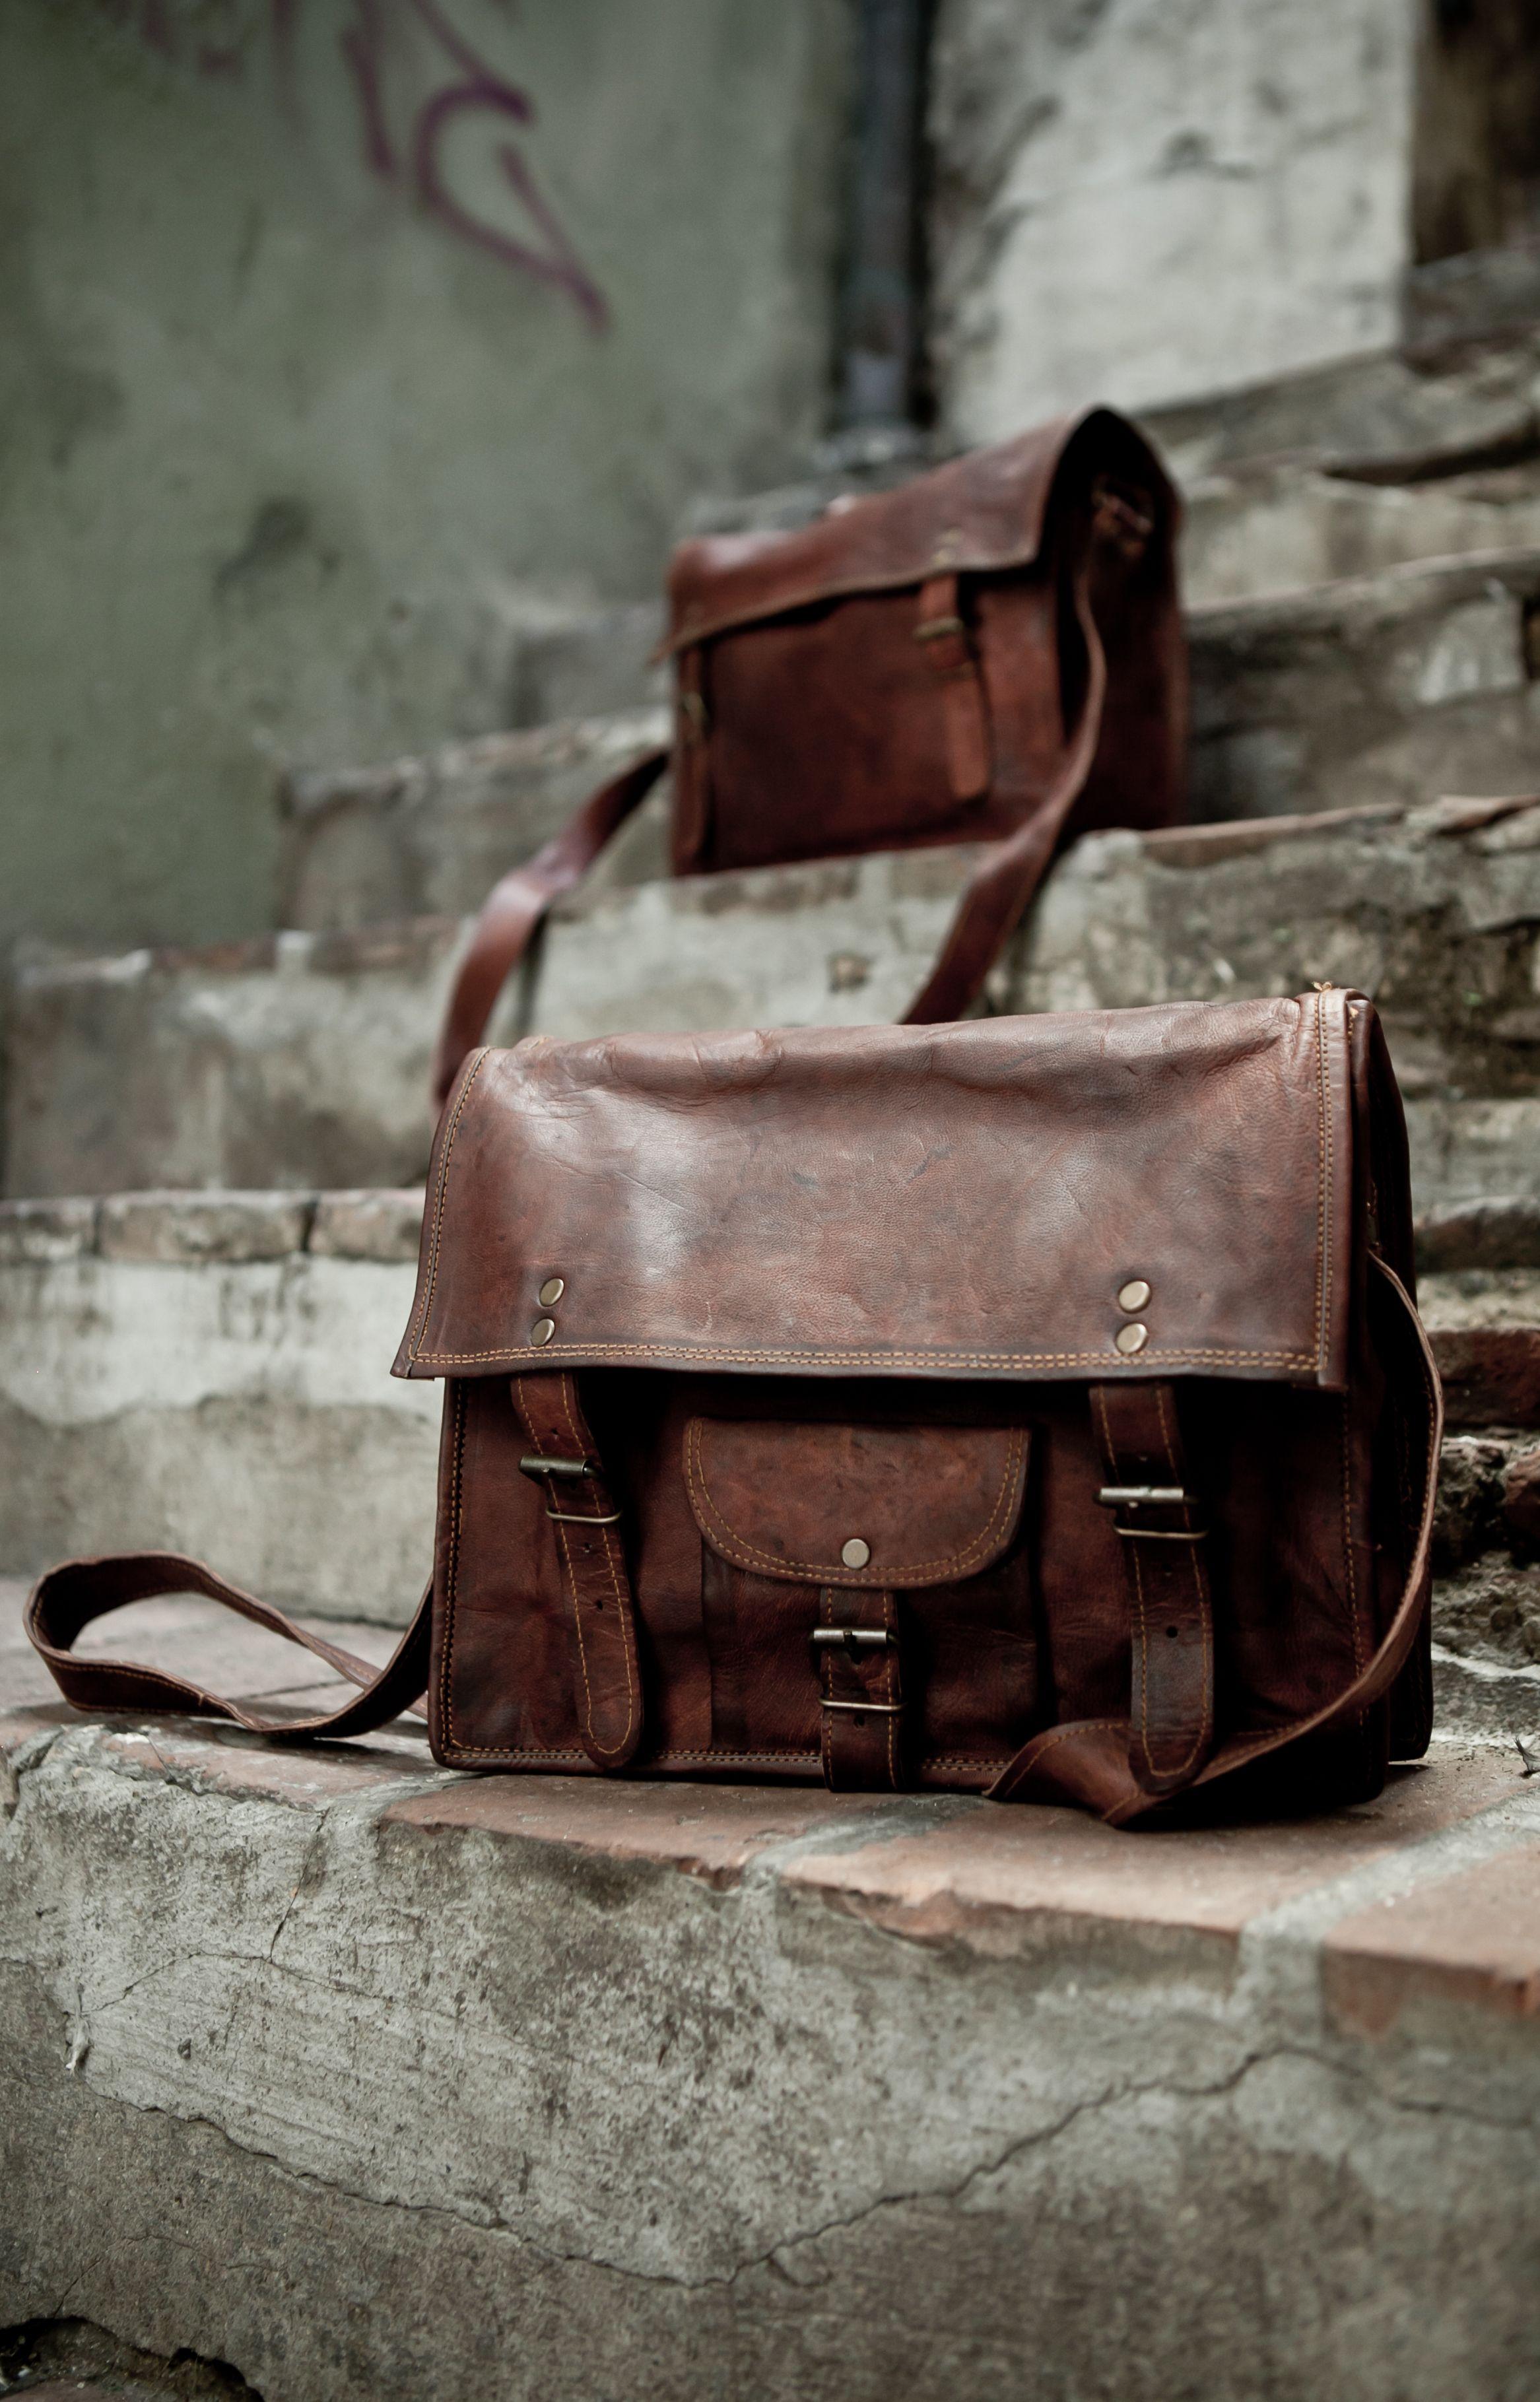 Handmade leather laptop bag satchels satchandfable.com